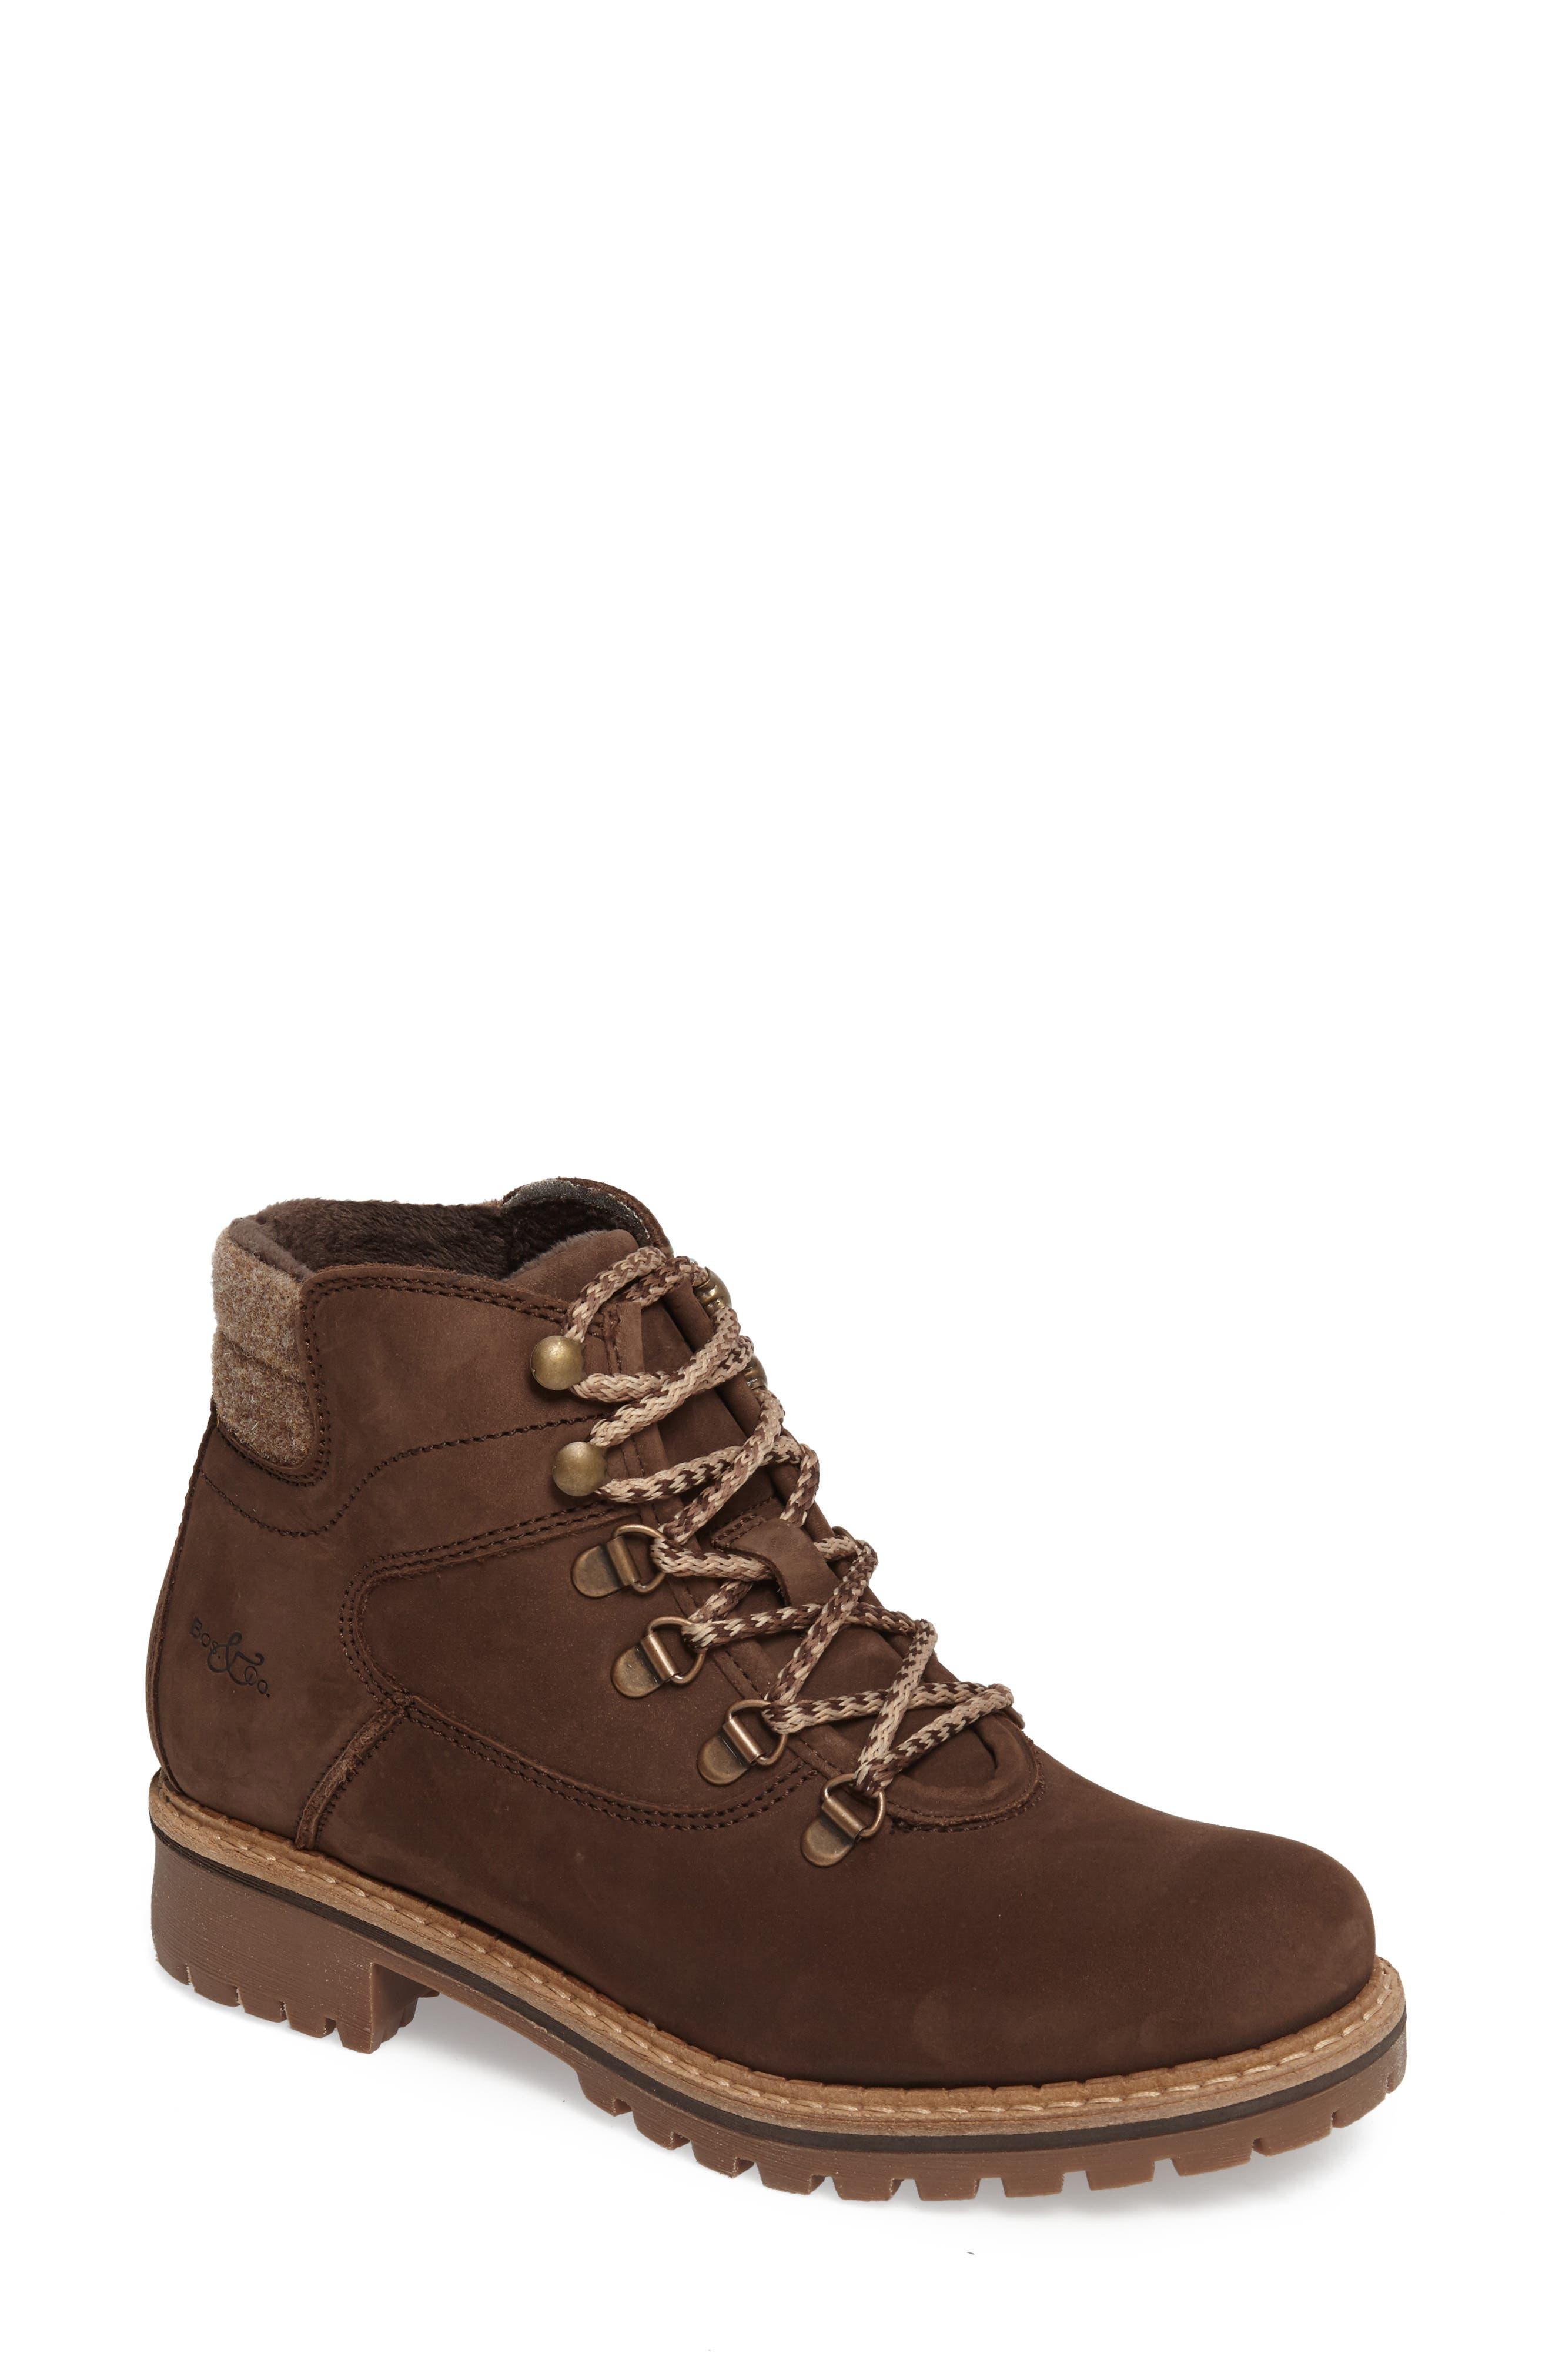 Alternate Image 1 Selected - Bos. & Co. Hartney Waterproof Boot (Women)